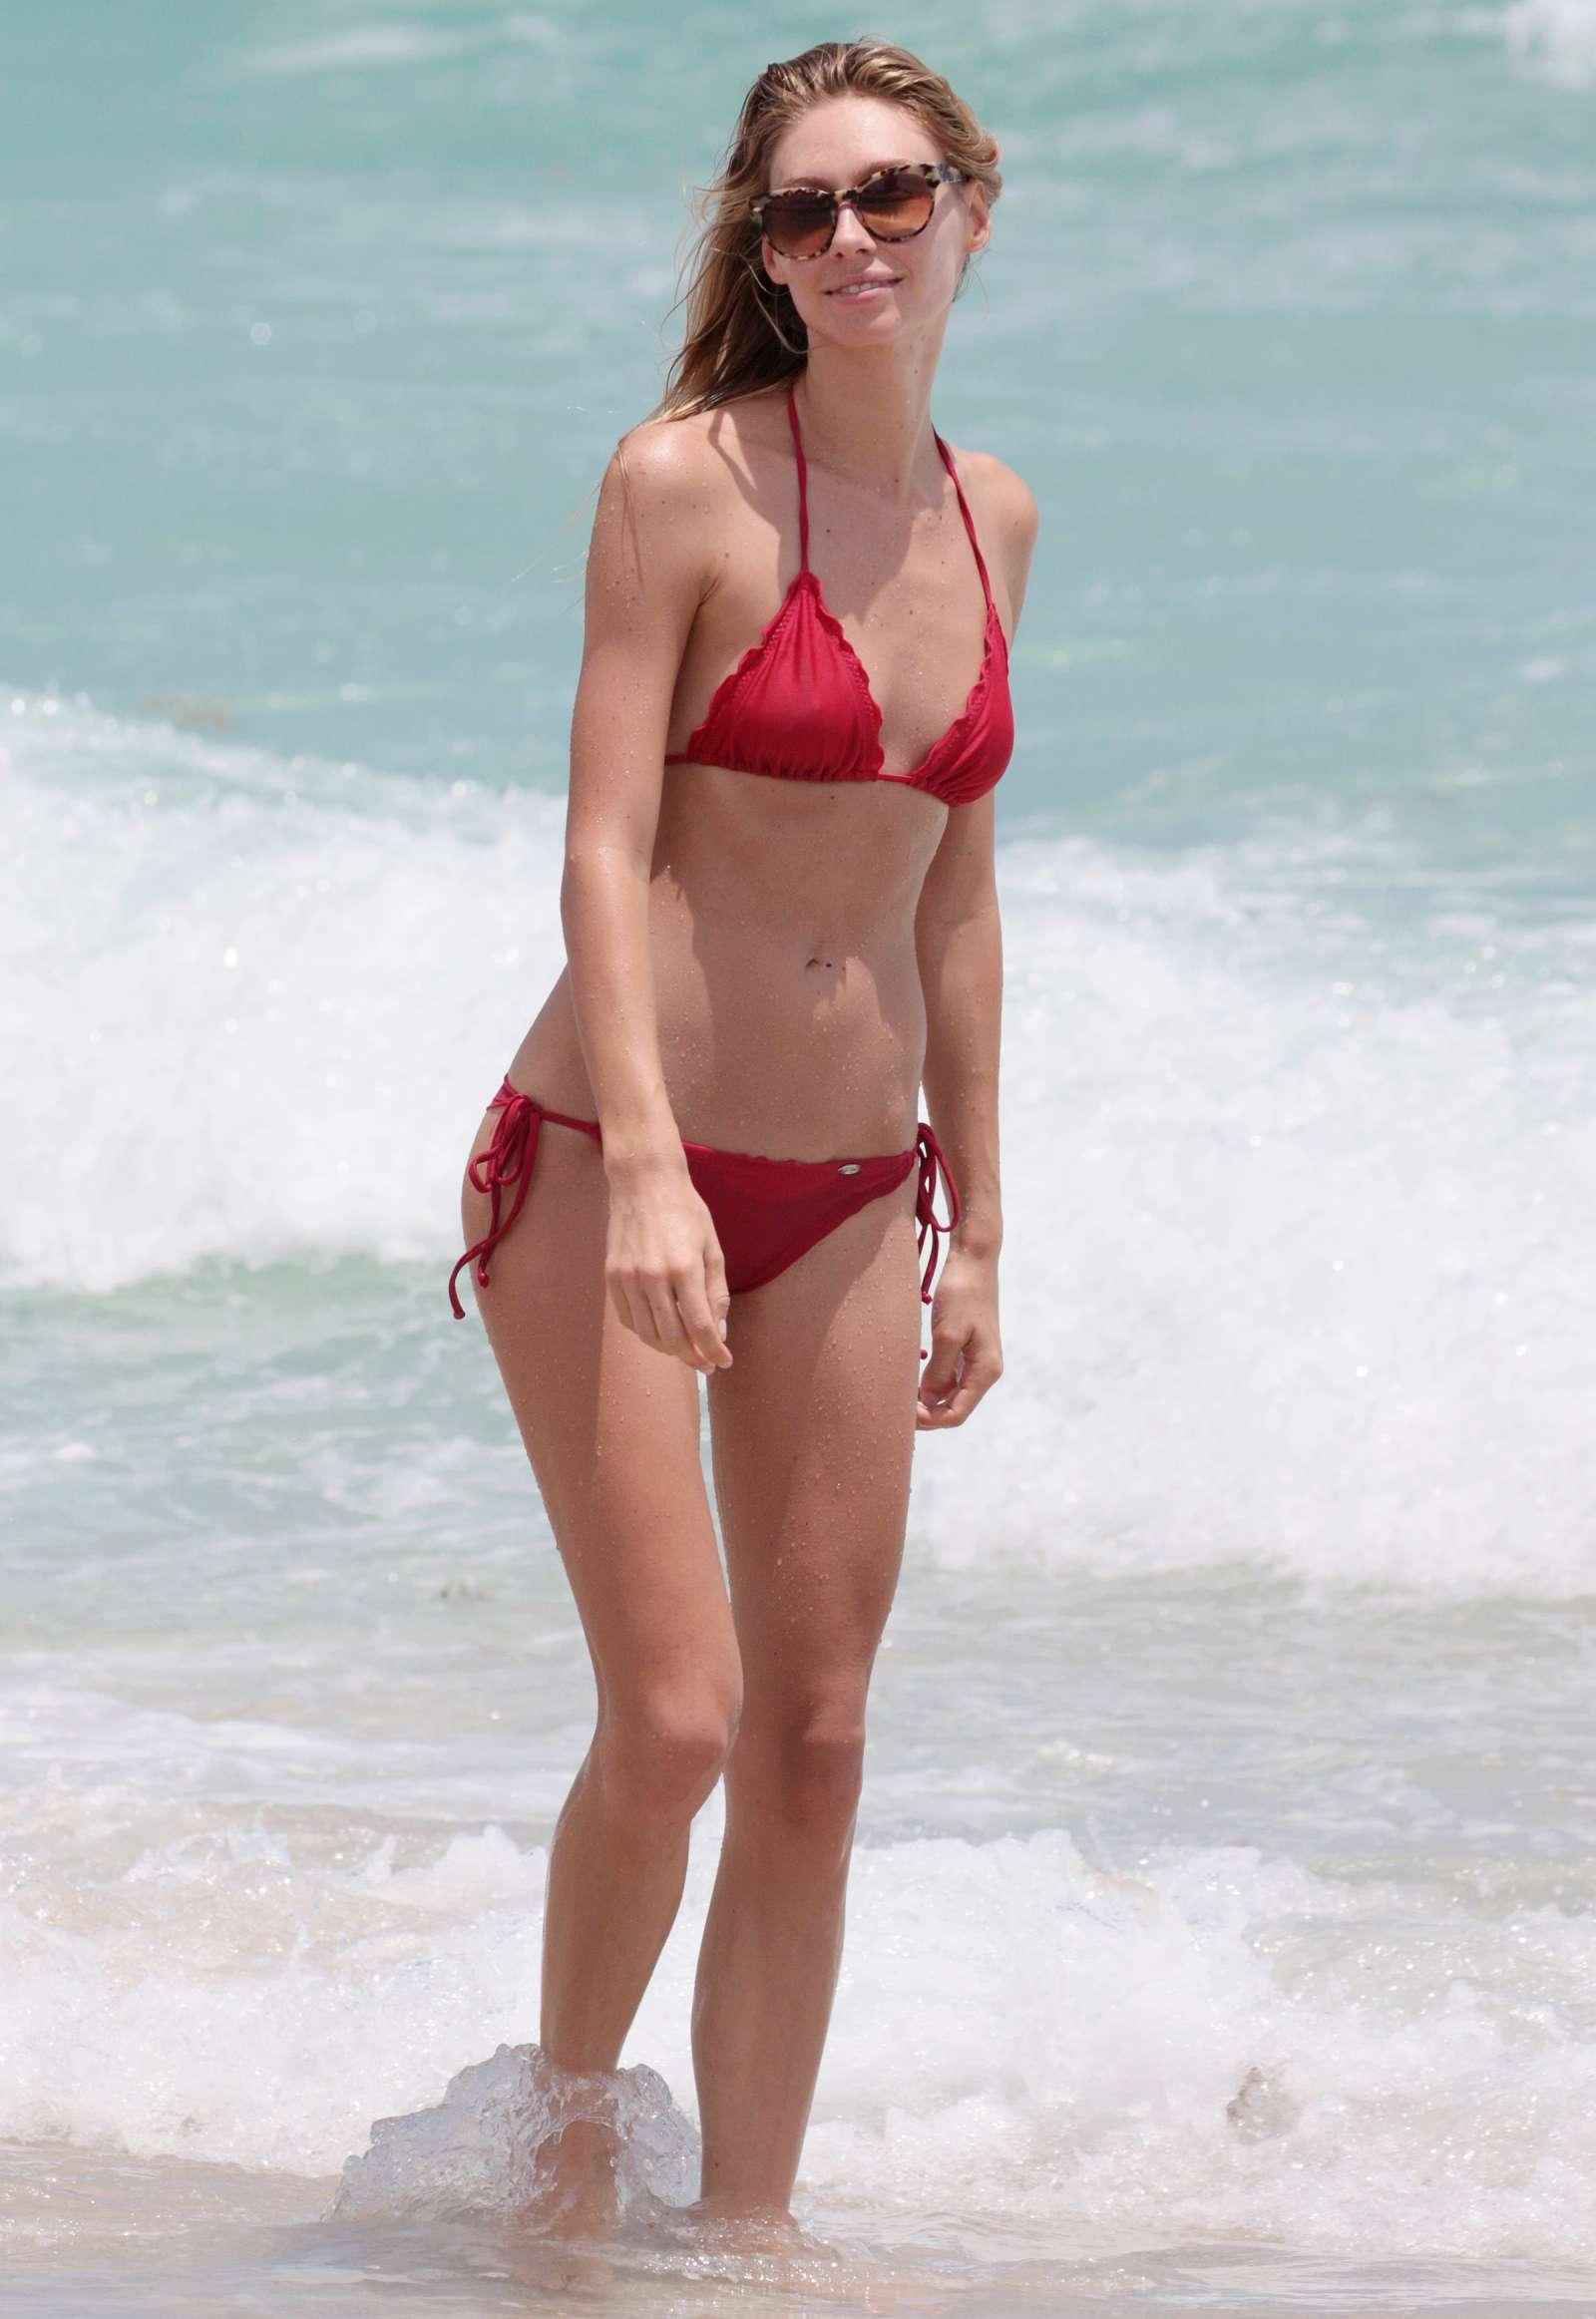 ICloud Brianna Addolorato nudes (86 photo), Topless, Bikini, Feet, underwear 2017